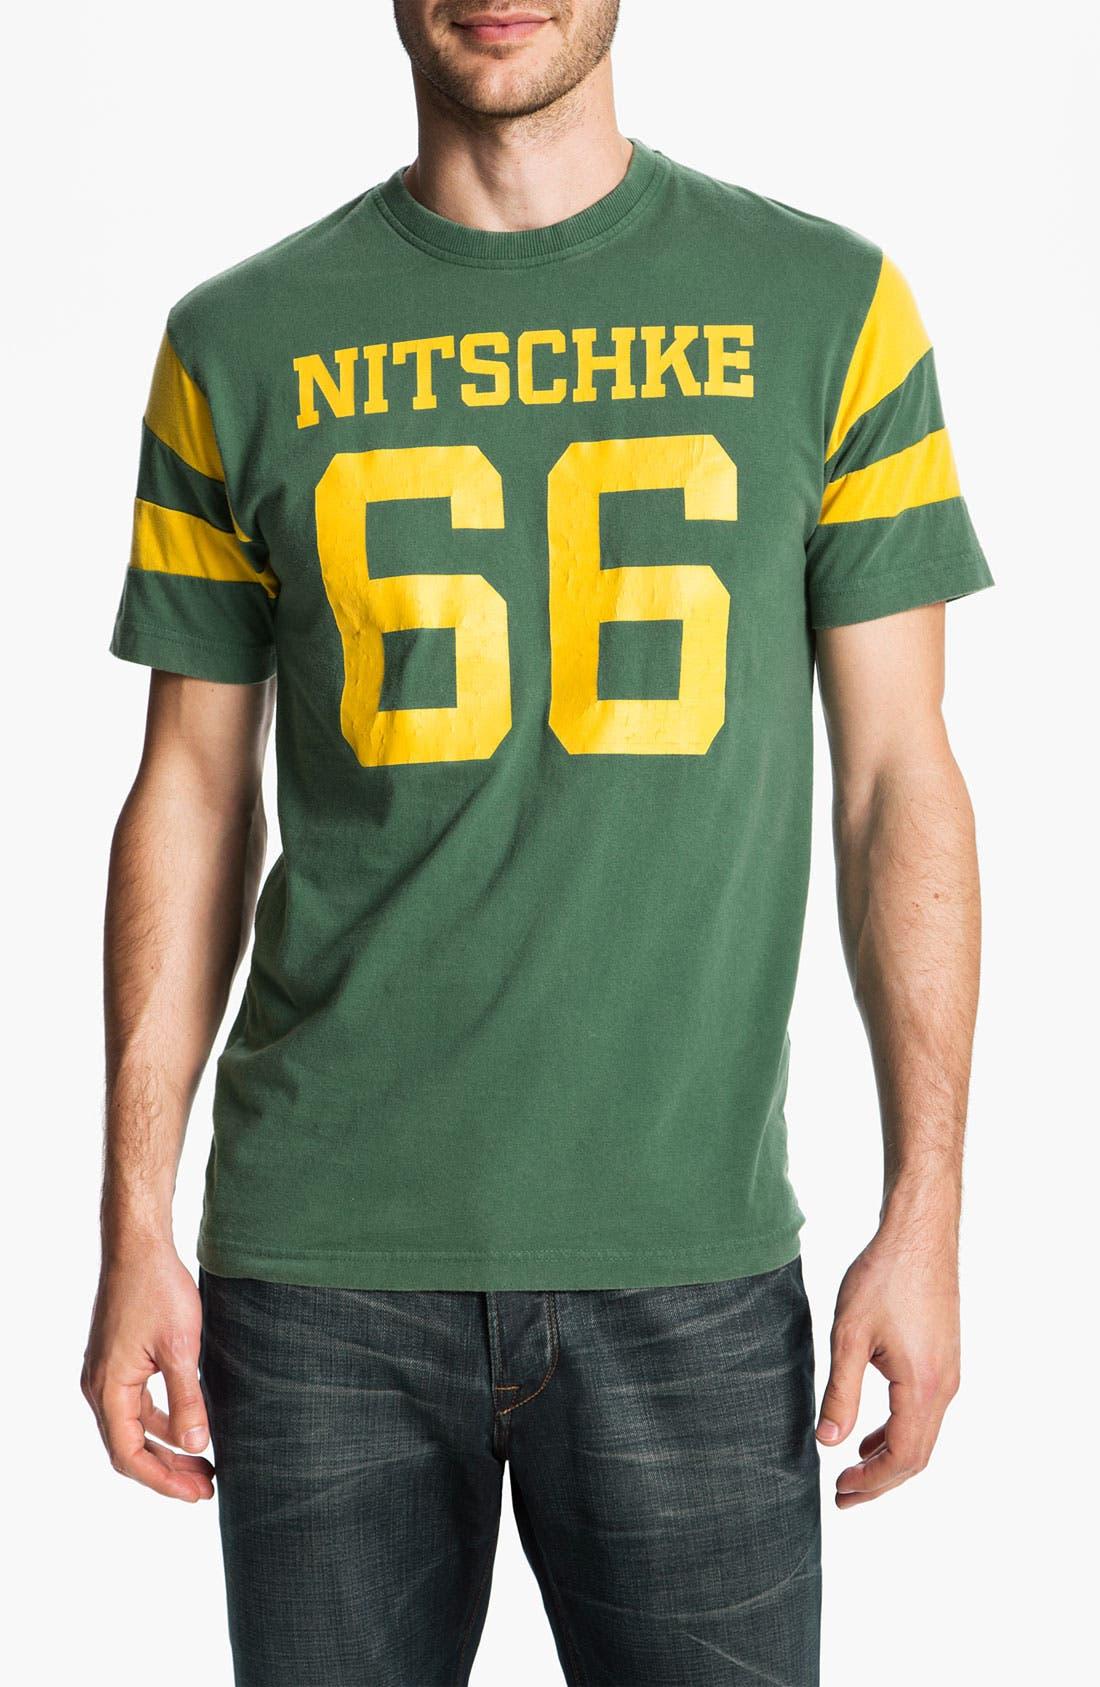 Alternate Image 1 Selected - Red Jacket 'Ray Nitschke - Nickel' T-Shirt